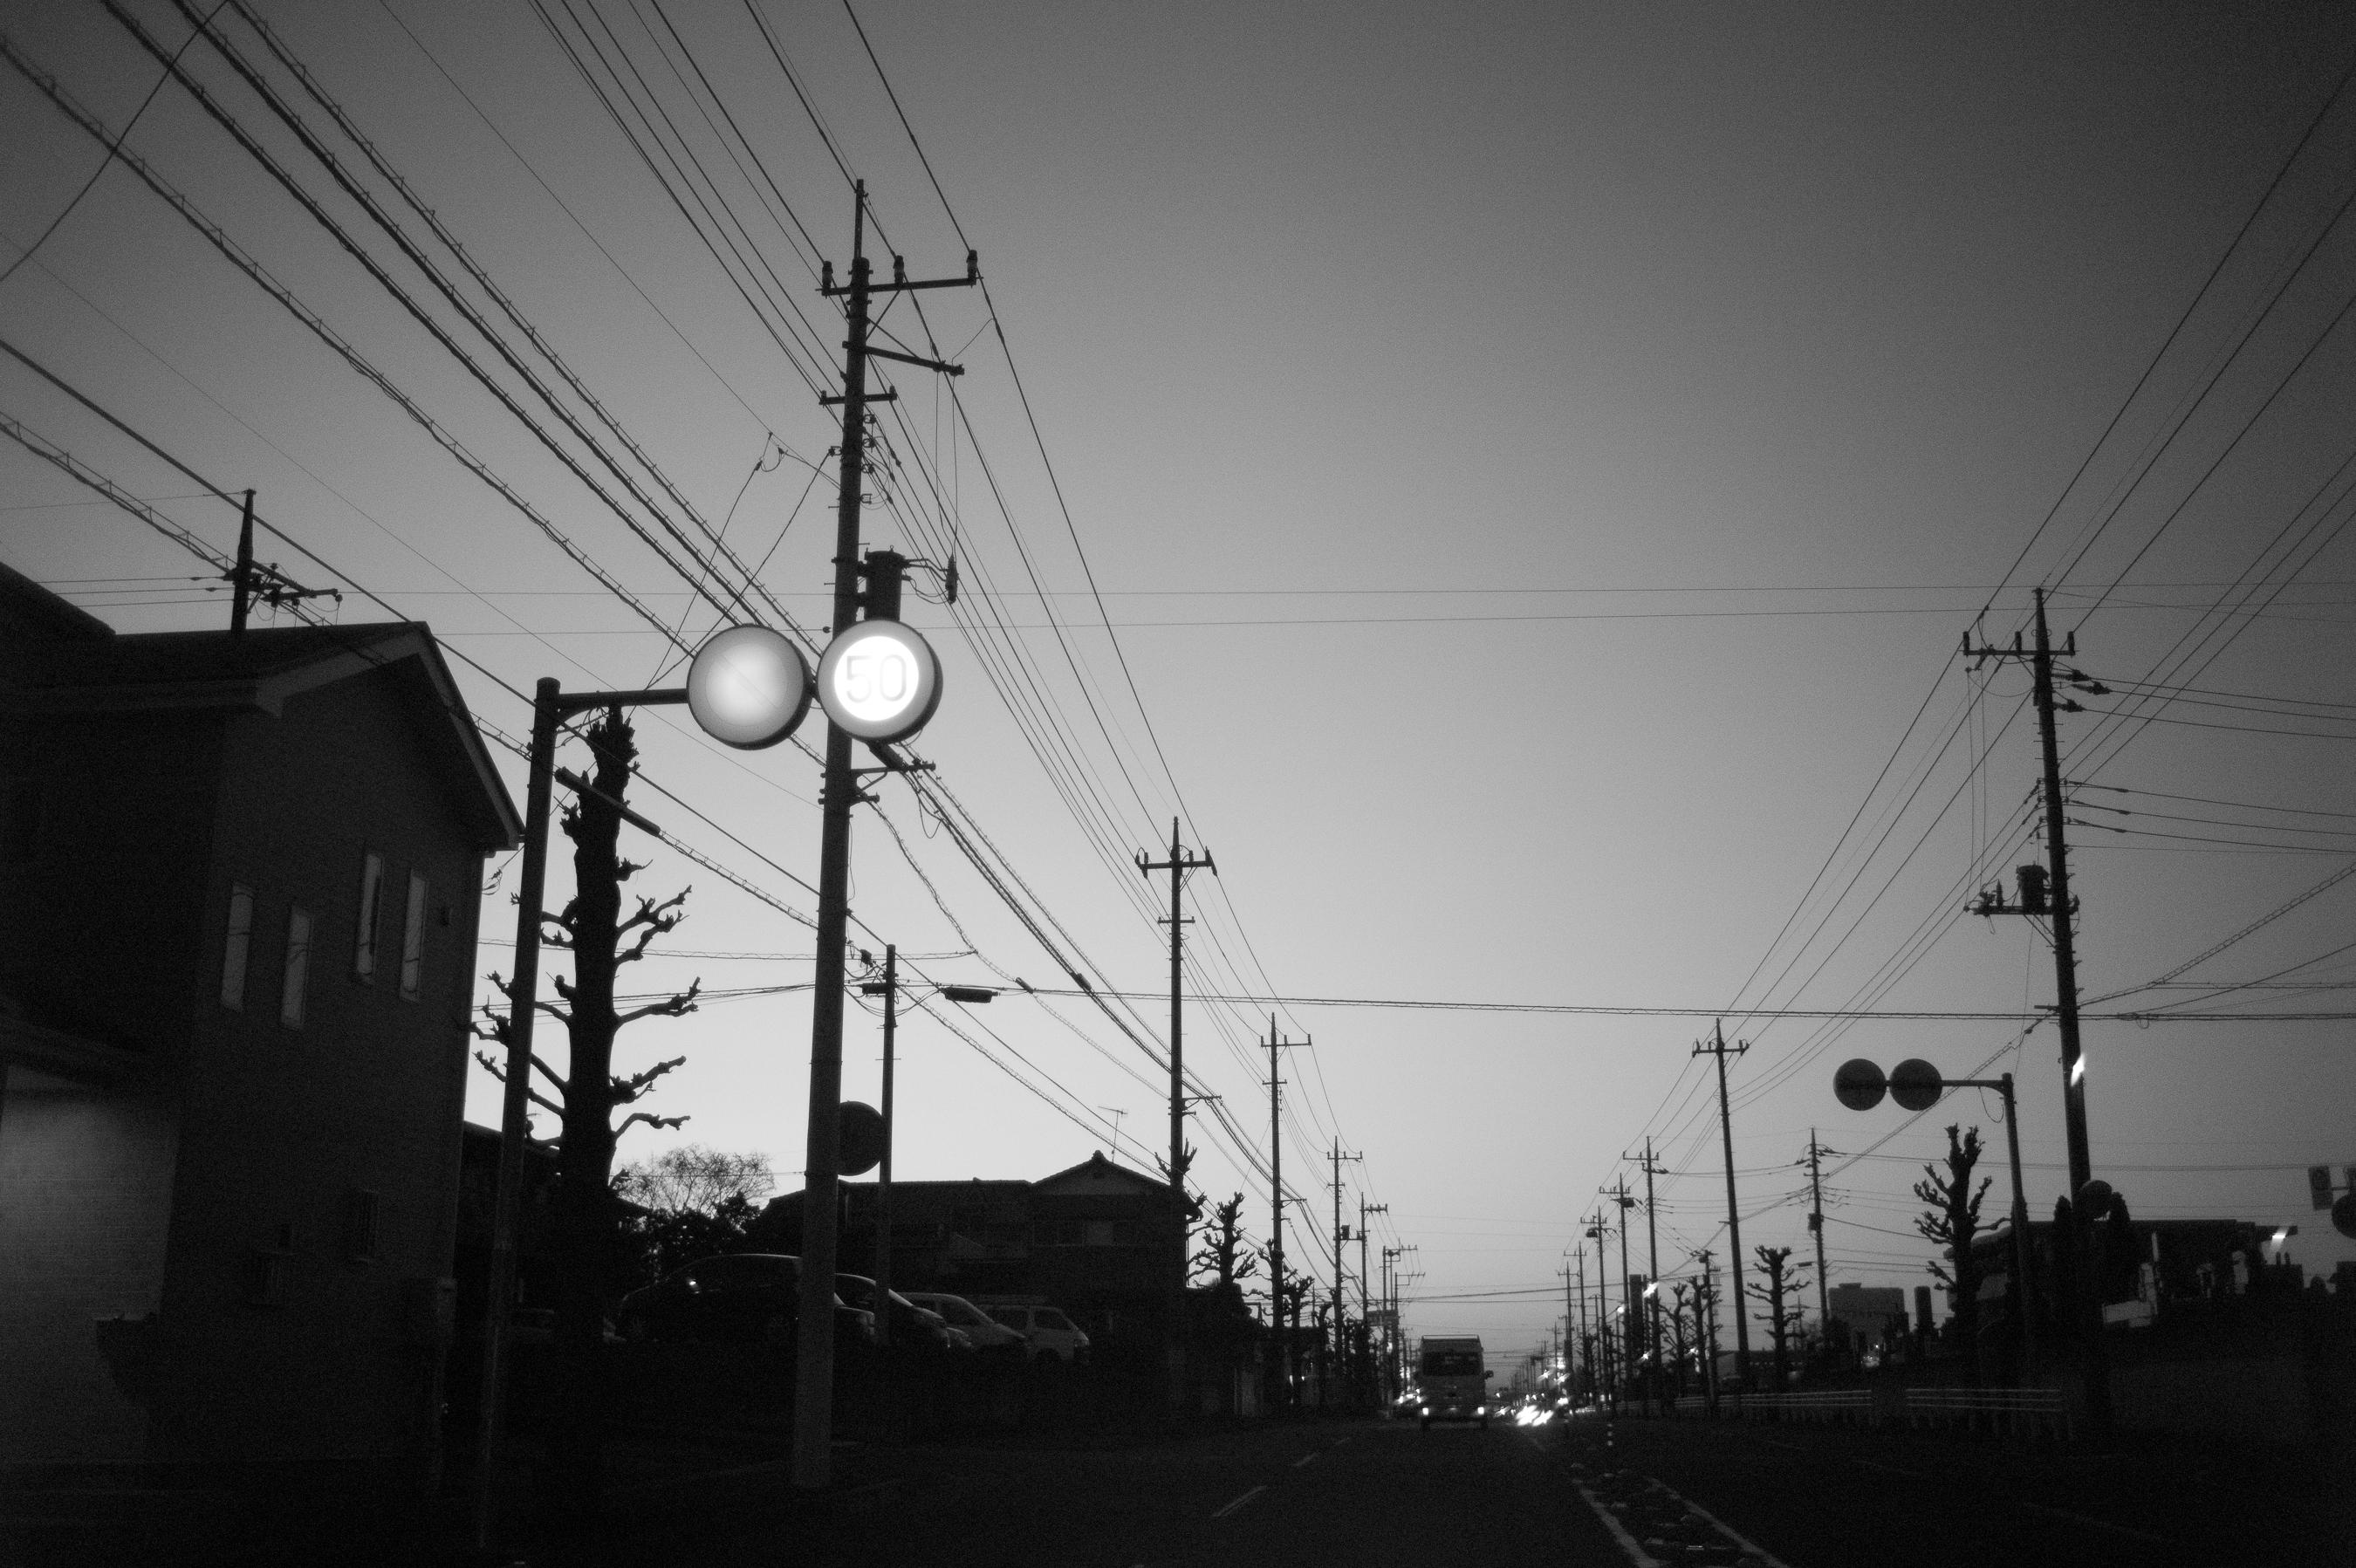 f:id:aoyama-takuro:20180303091423j:plain